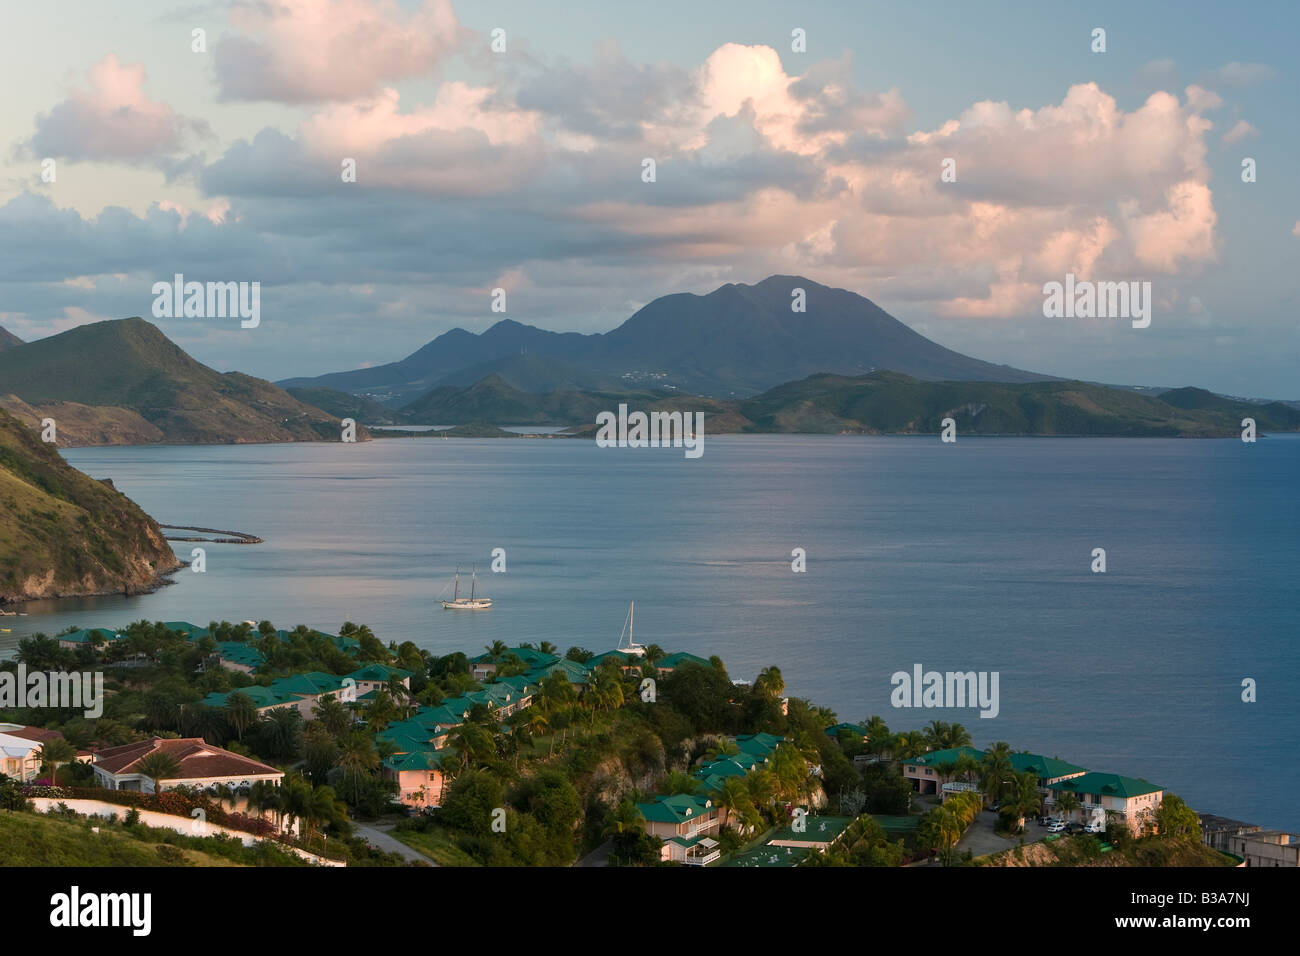 Saint Kitts e Nevis, Saint Kitts, Brimstone Hill, Brimstone Hill Fortress Foto Stock